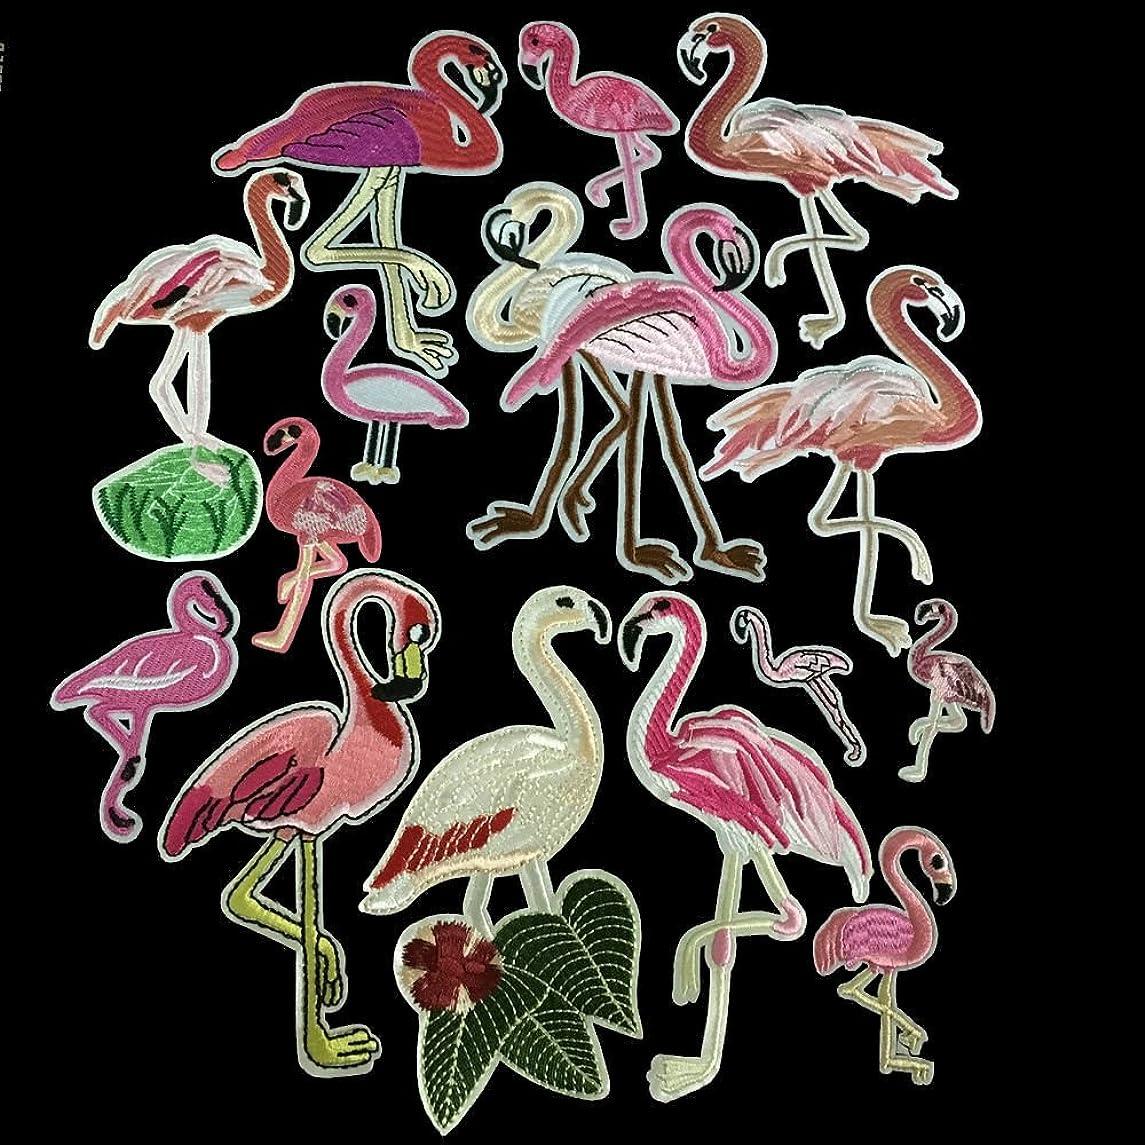 15pcs/Set Flamingo Applique Embroidery Patches Sewing Patch Sticker Accessories Clothing Clothes Parches